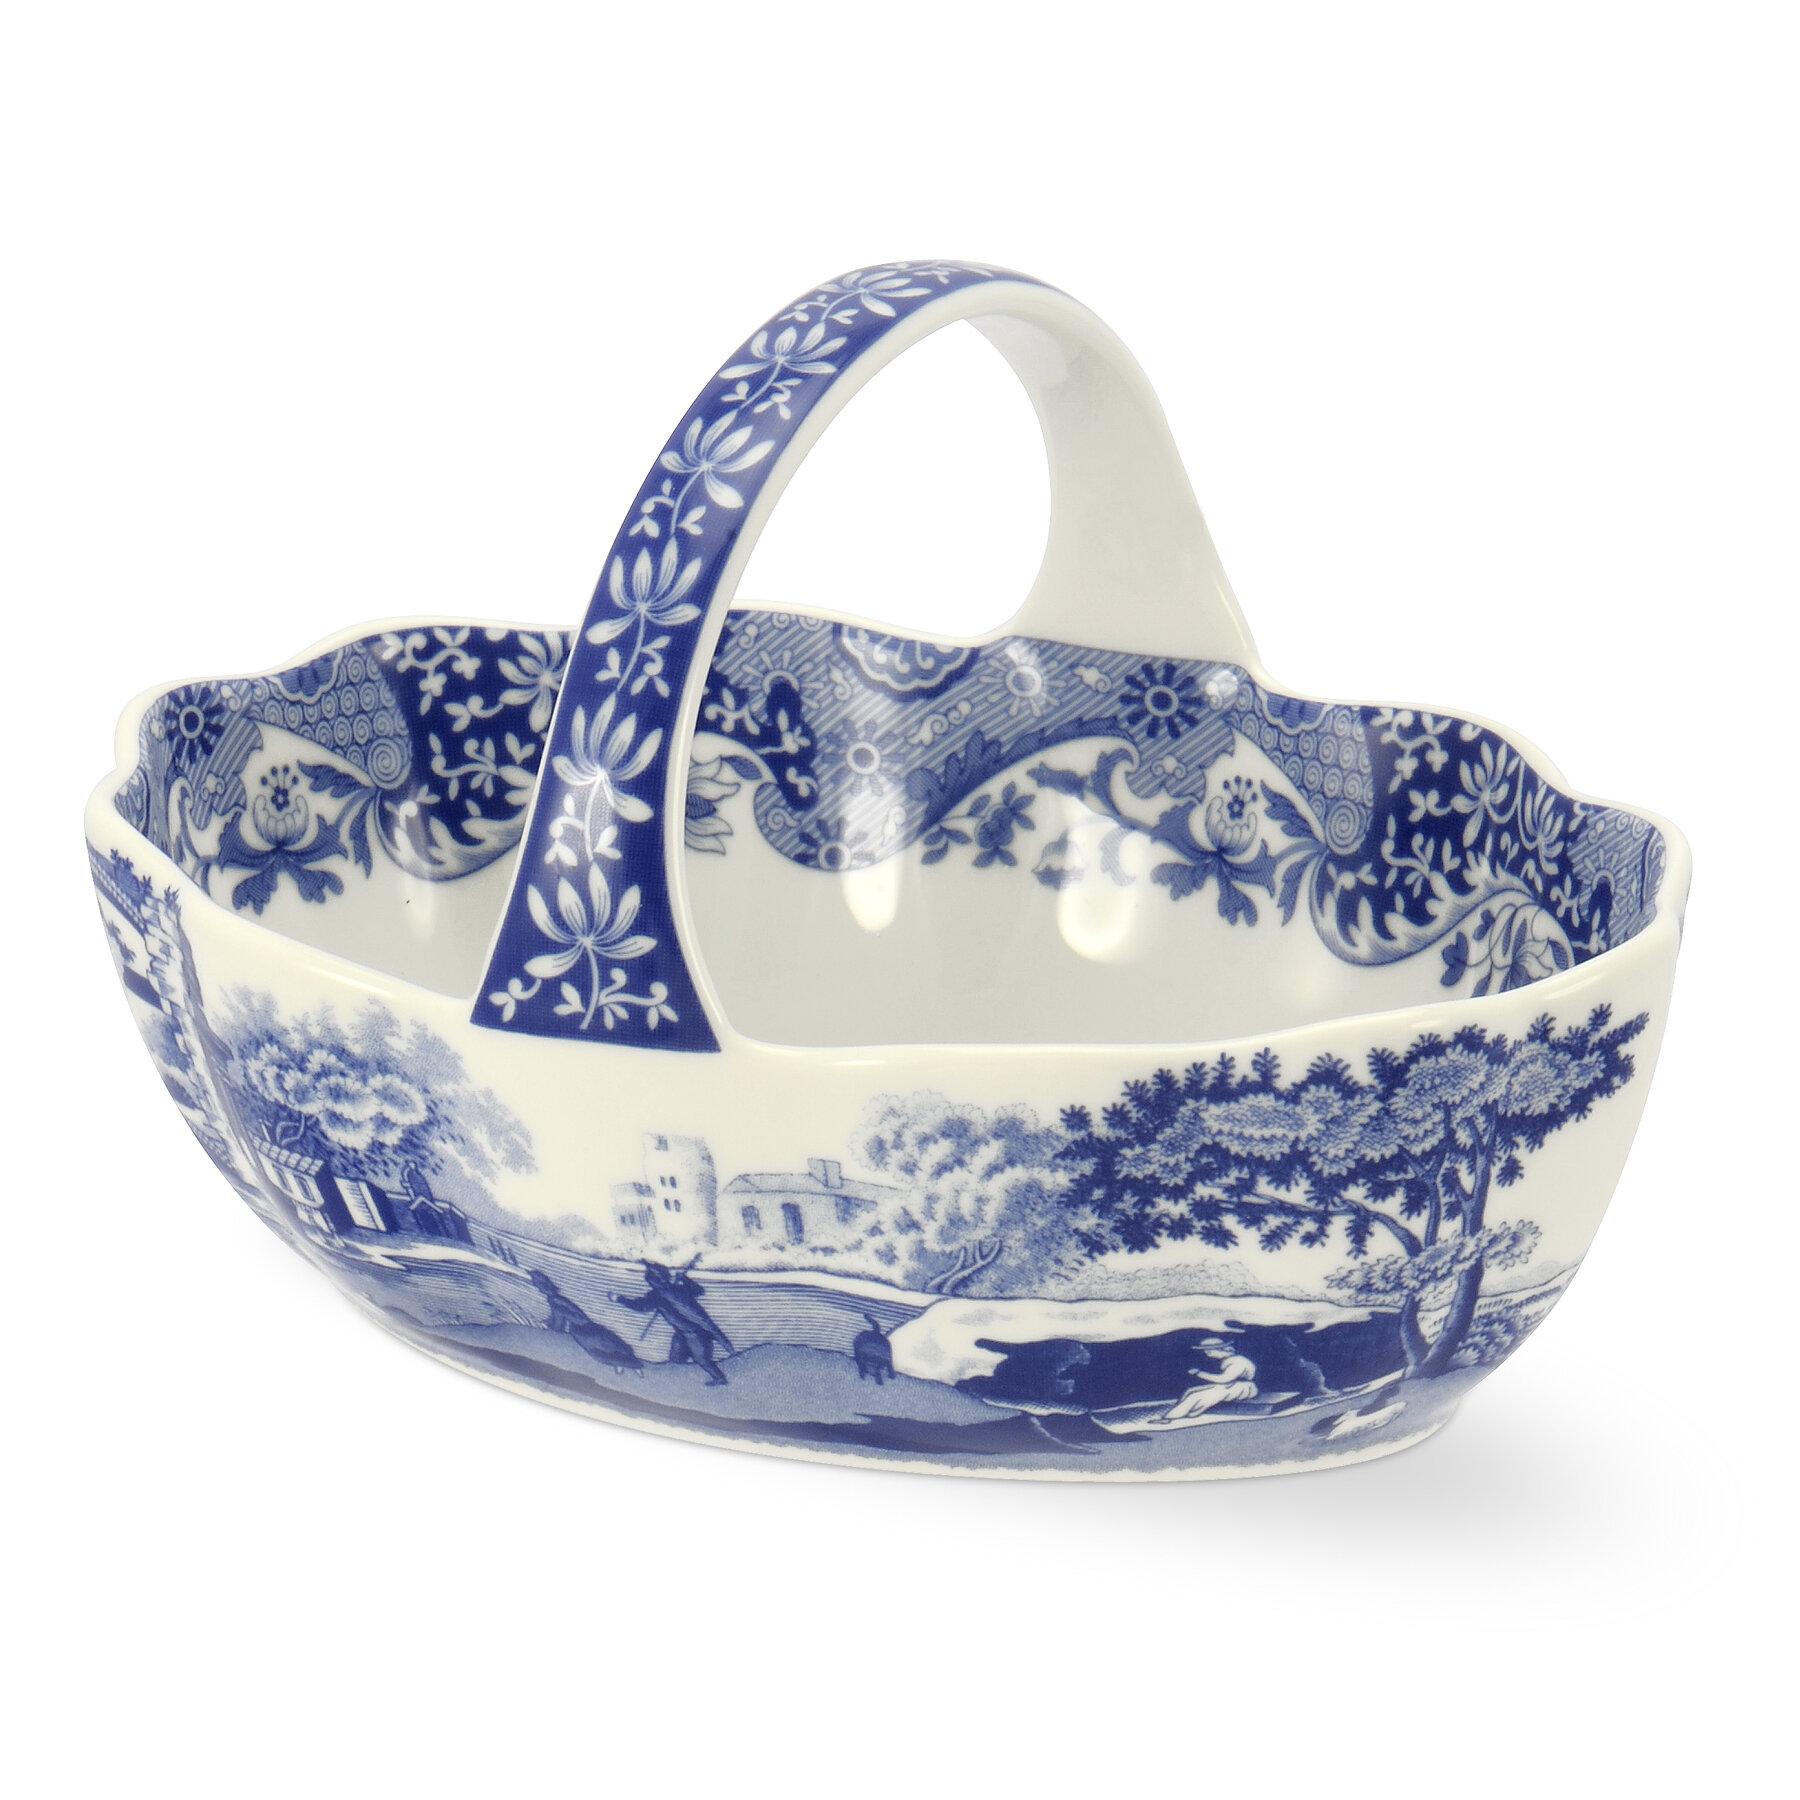 Spode Blue Italian Handled Basket Decorative Bowl Birch Lane